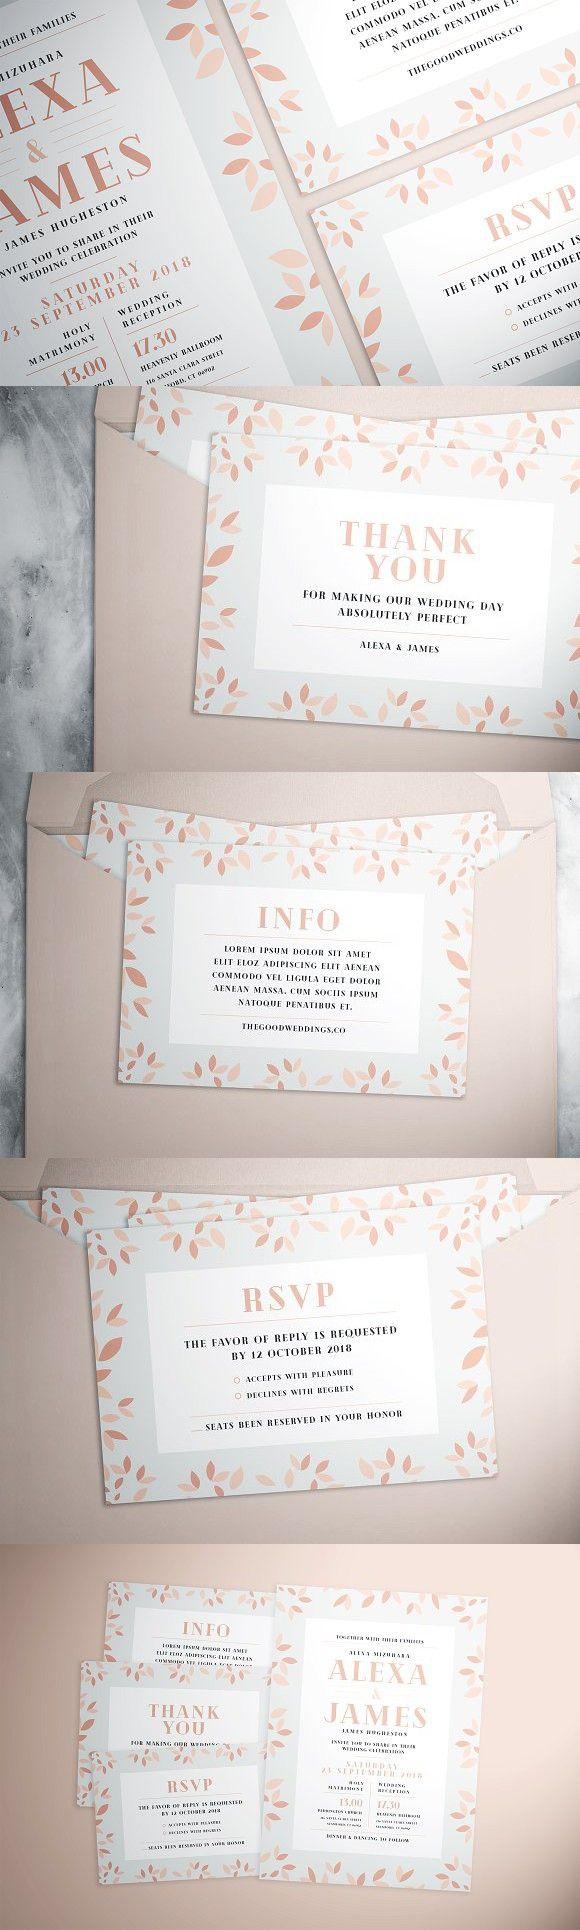 wedding card backgrounds vectors%0A Simple Flower Wedding Suite  Wedding Card Templates